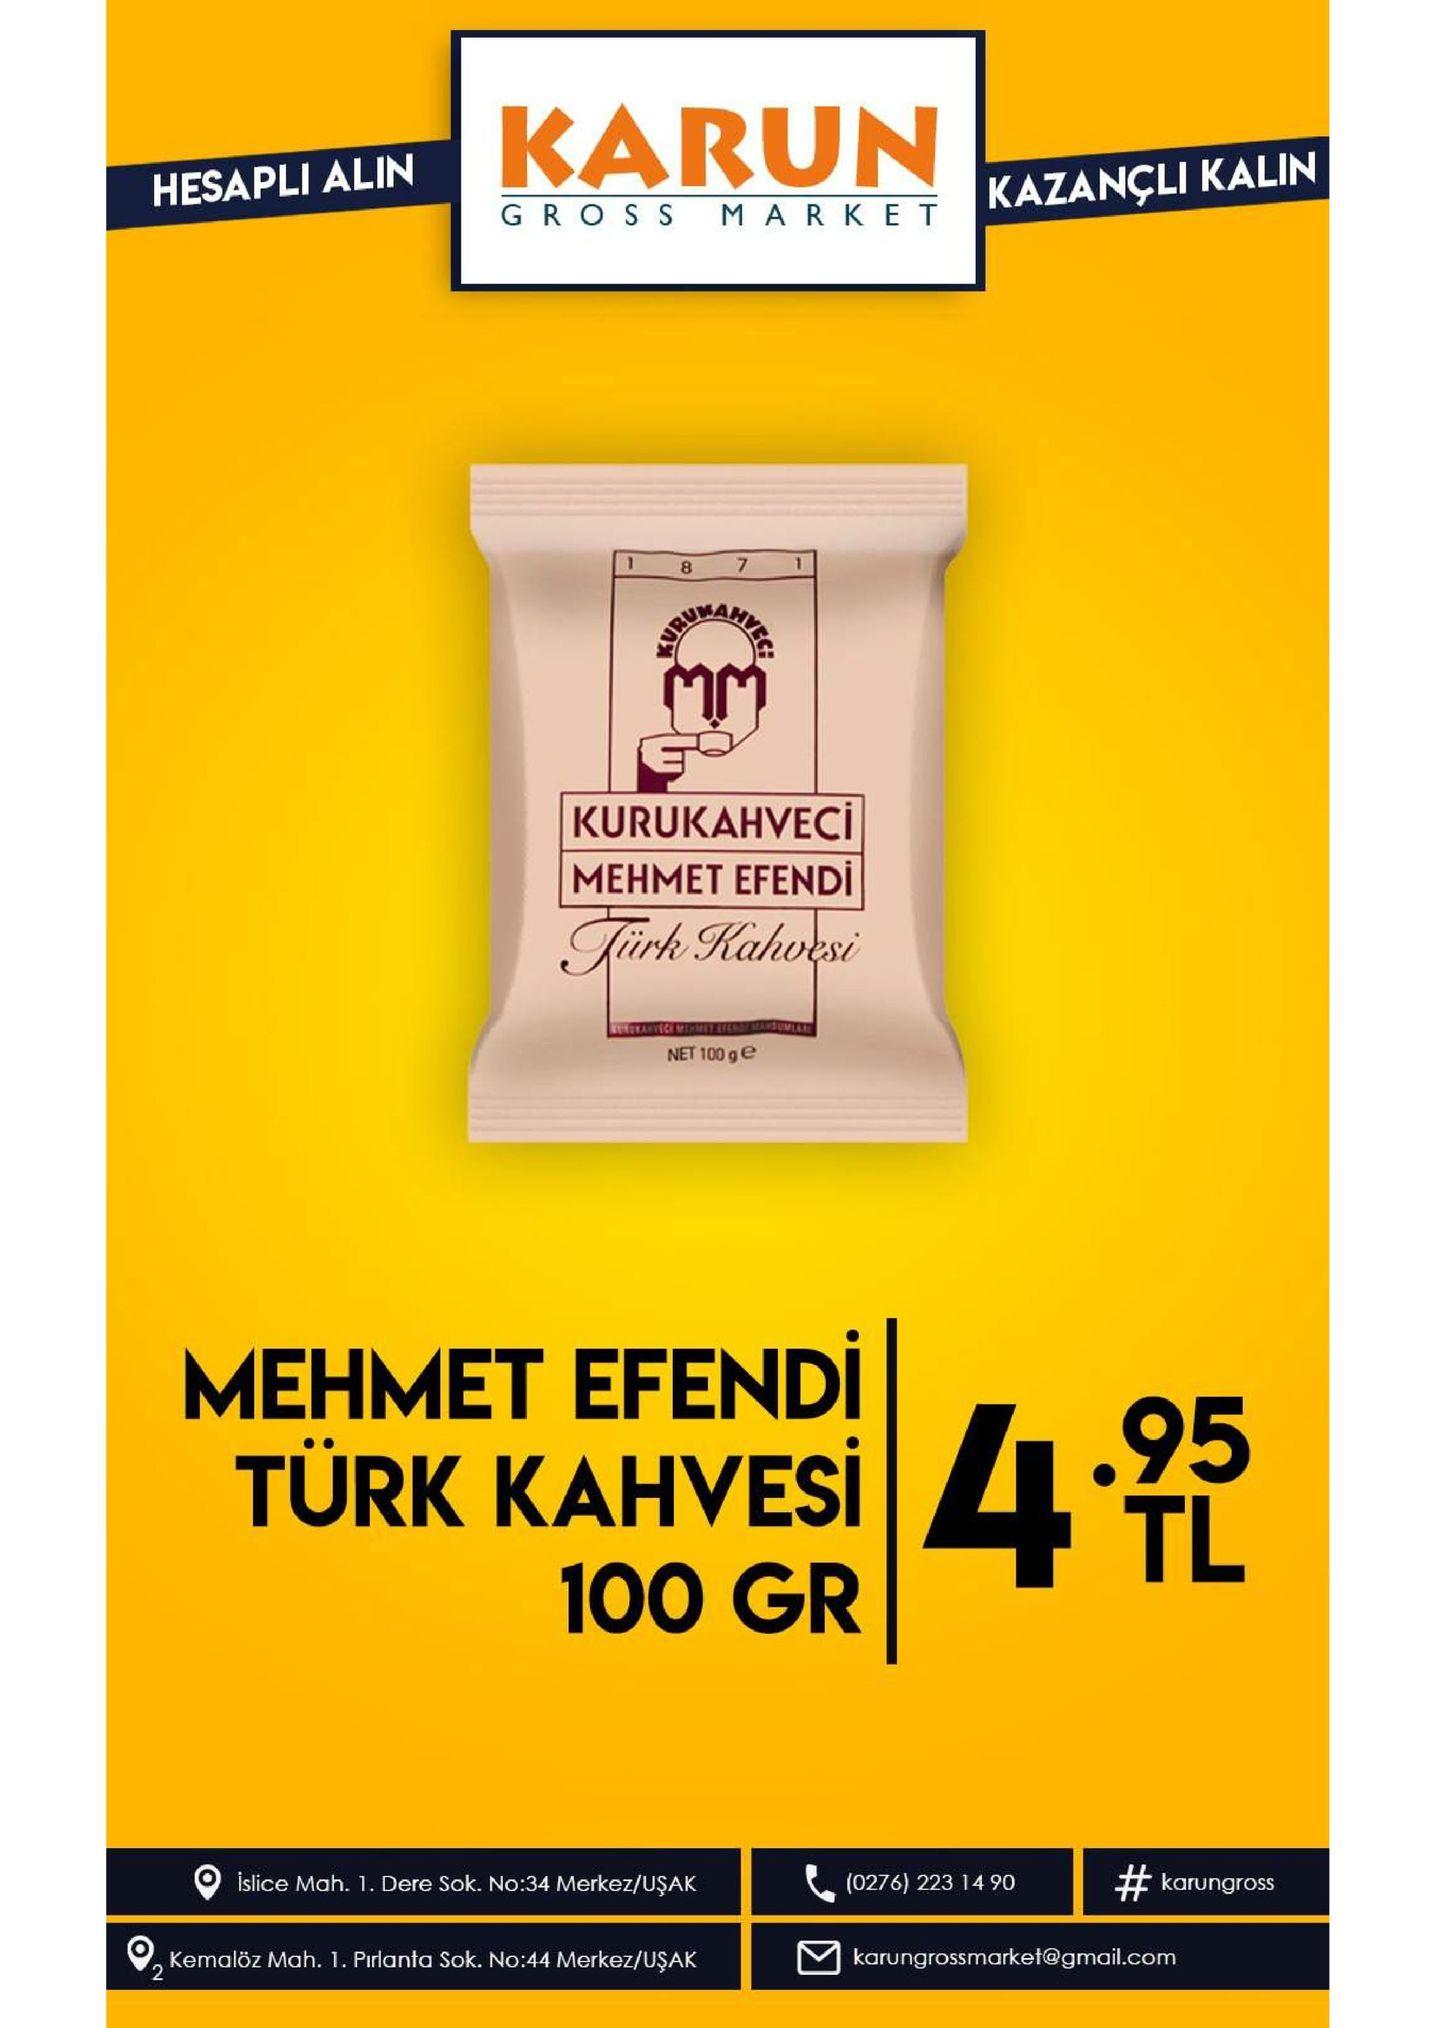 karun kazancli kalin hesapli alin gros s mark e t 7 1 mm kurukahveci менмет еfendi tirk kahvesi net 100 g e mehmet efendi türk kahvesi |4- .95 tl 100 gr # islice mah. 1 dere sok. no:34 merkez/uşak karungross (0276) 223 14 90 karungrossmarket@gmail.com kemalöz mah. 1. pirlanta sok. no:44 merkez/uşak 2